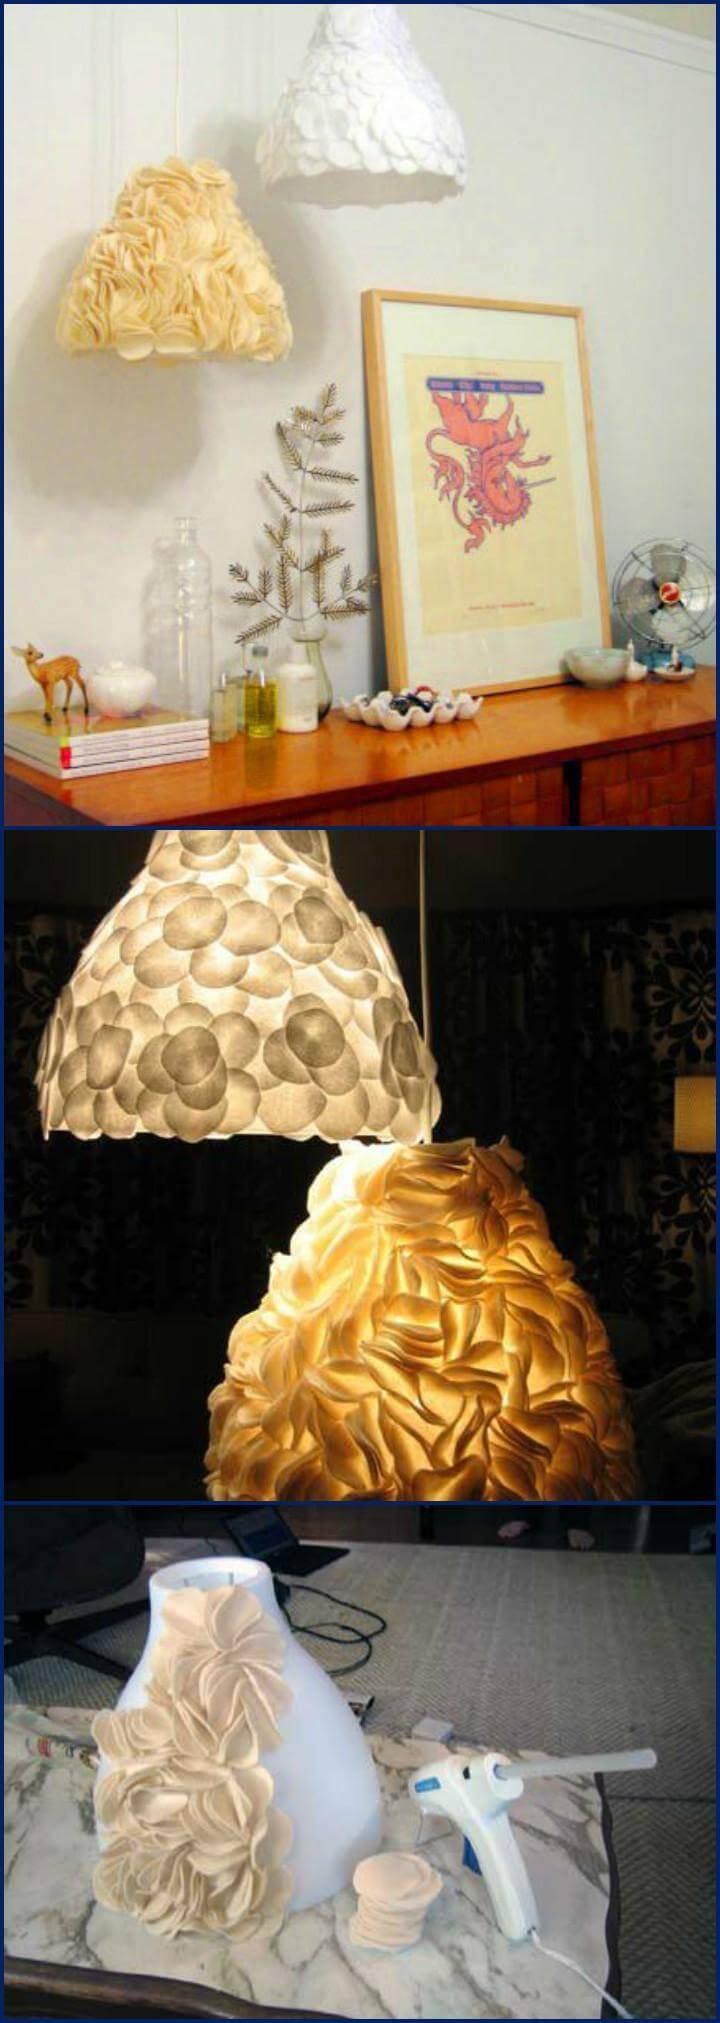 handmade sculptural pendant lamps